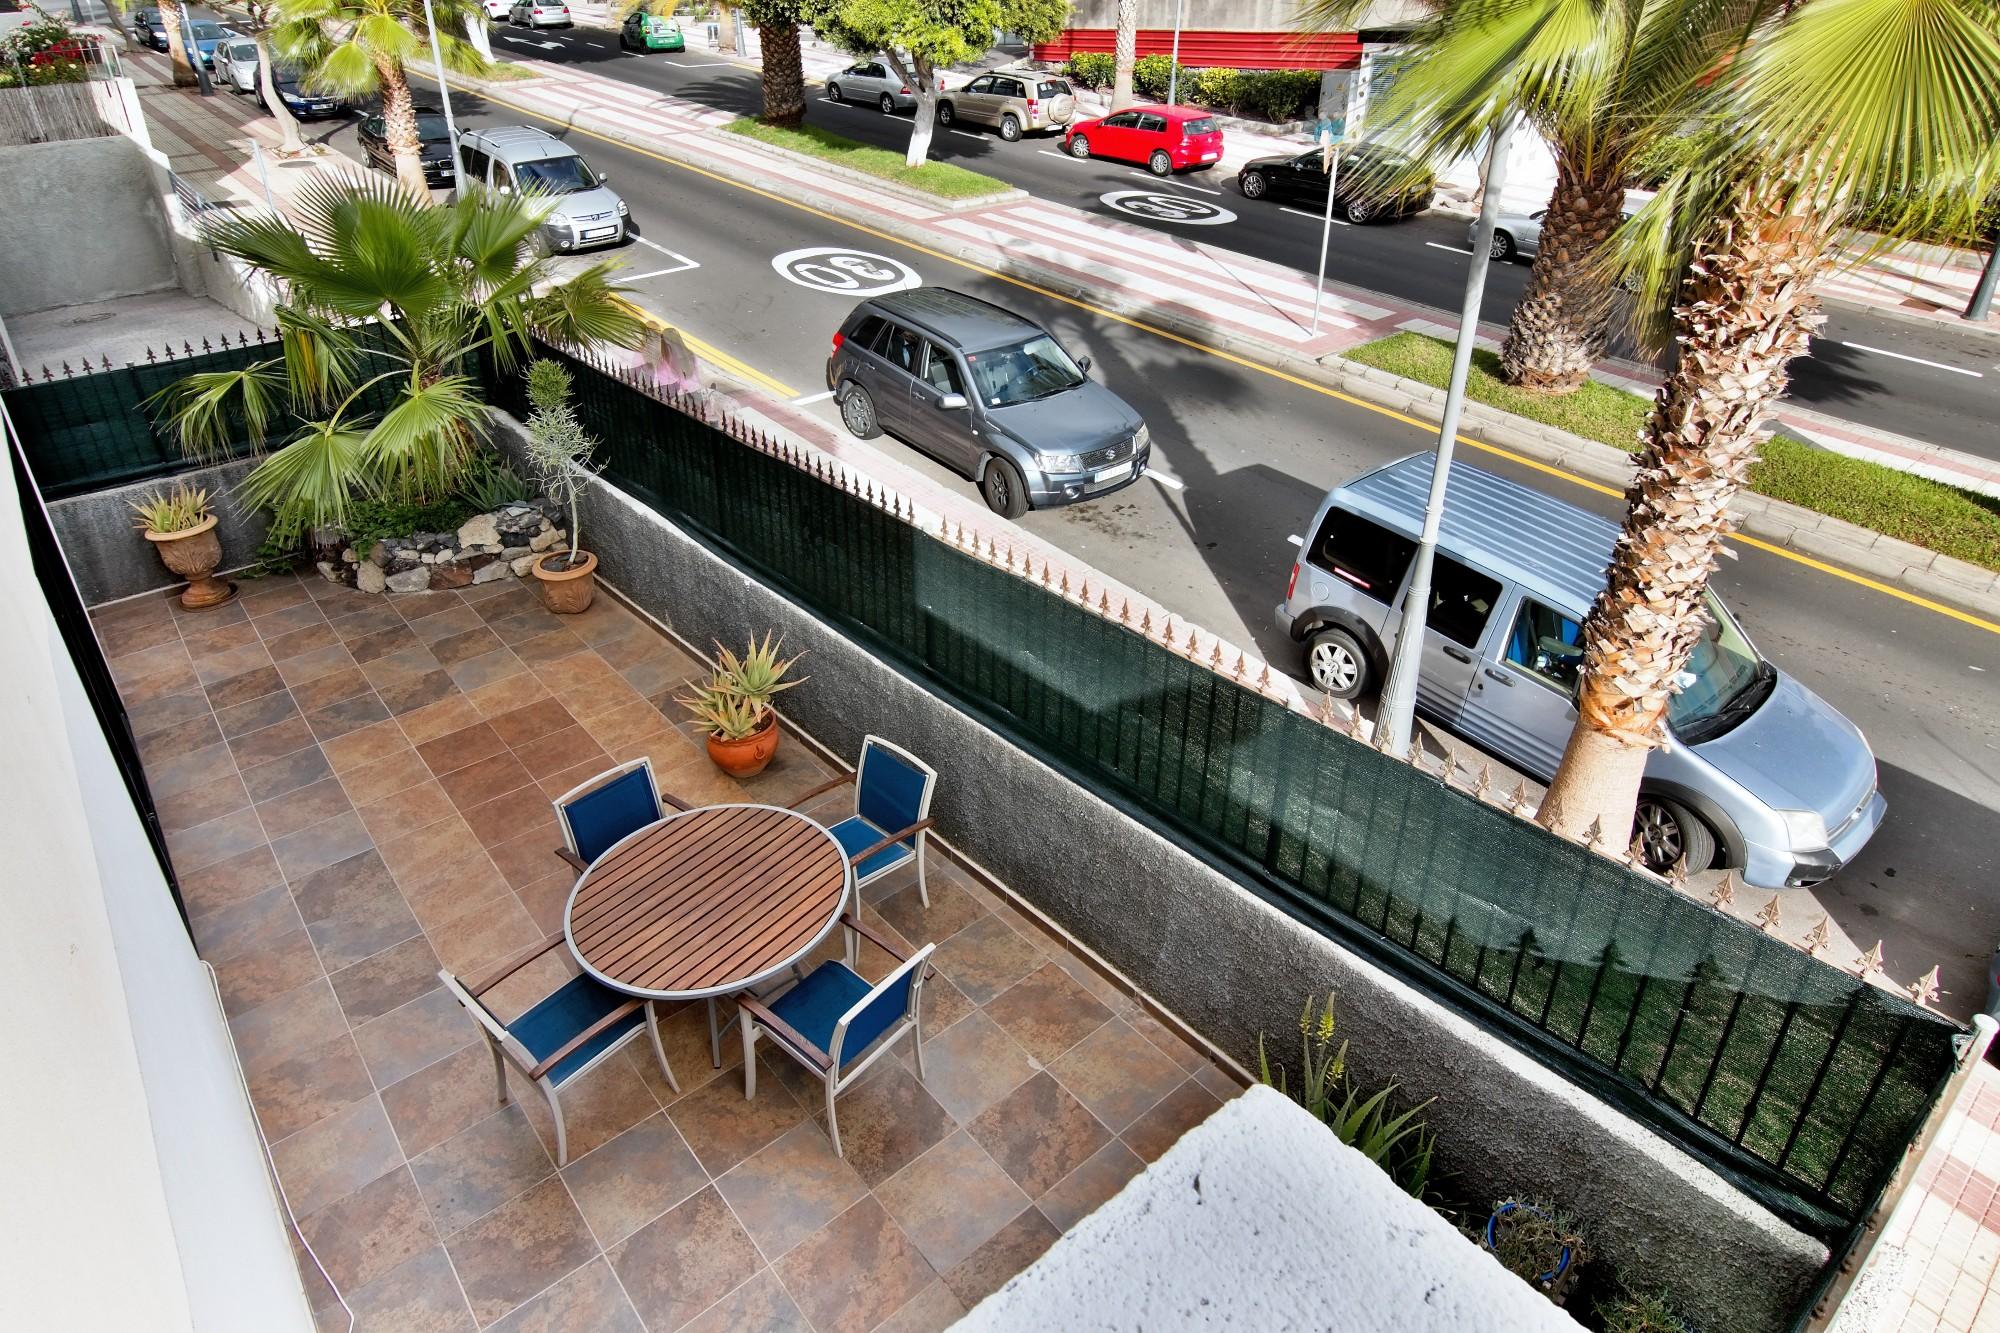 Terrasse Gartenmöbel Ferienhaus Adeje Teneriffa